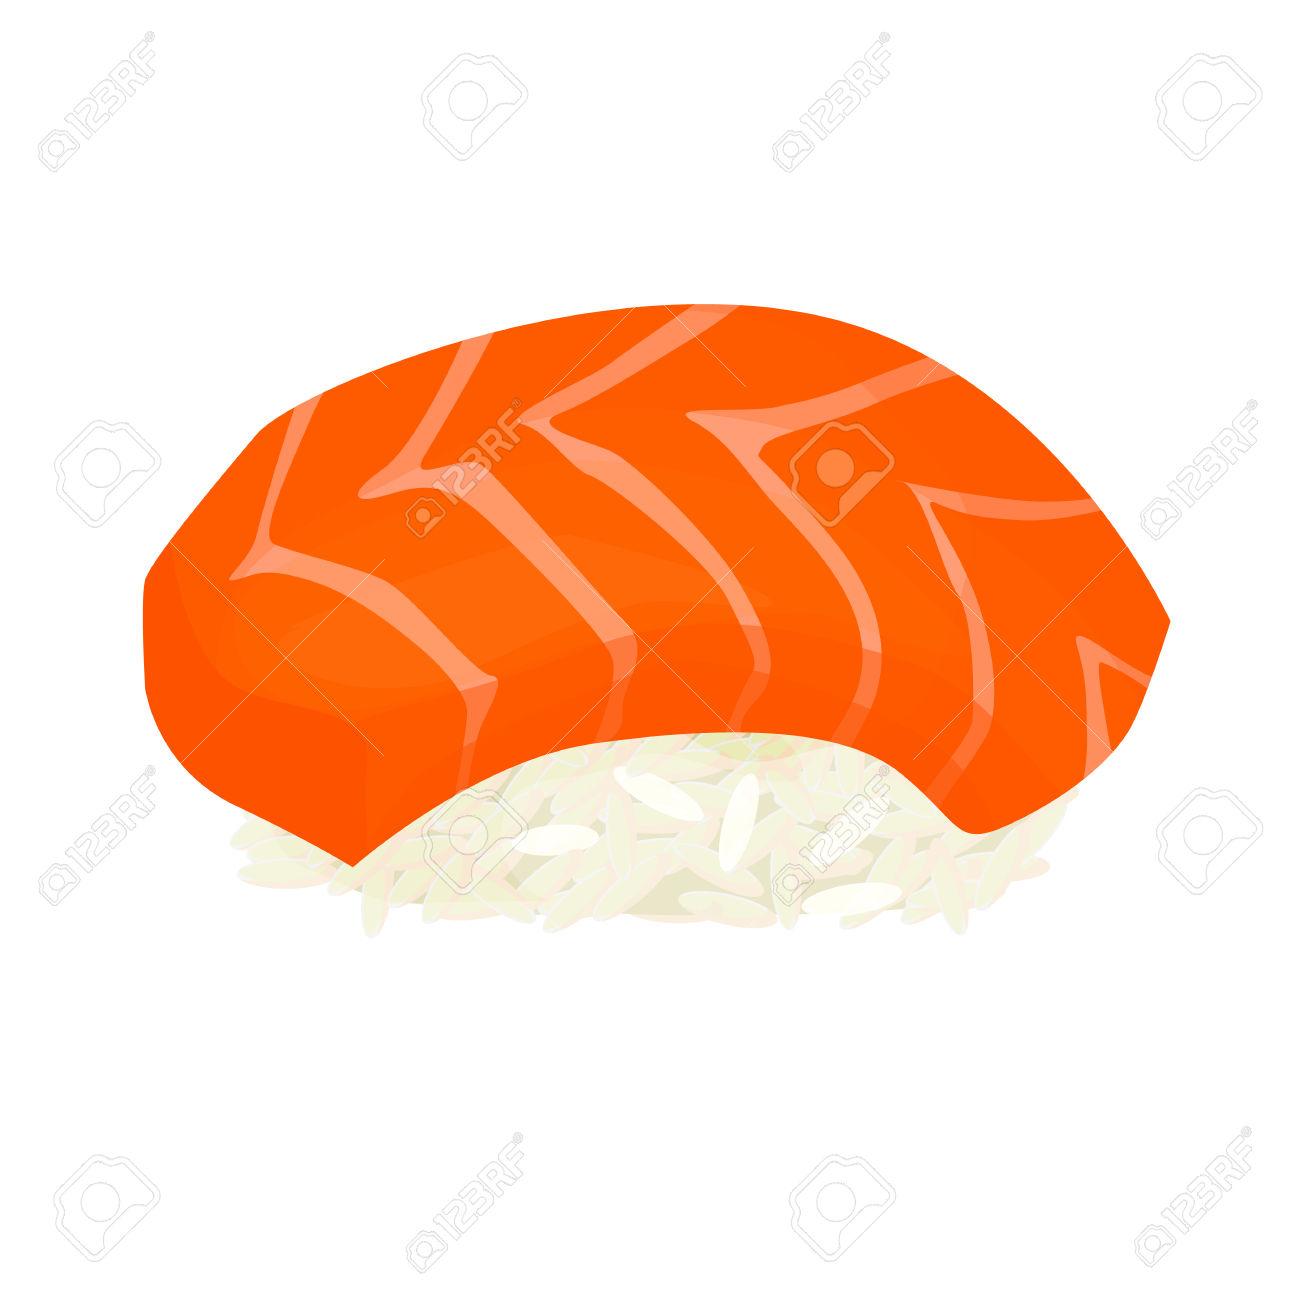 http://clipground.com/images/salmon-bun-clipart-19.jpg